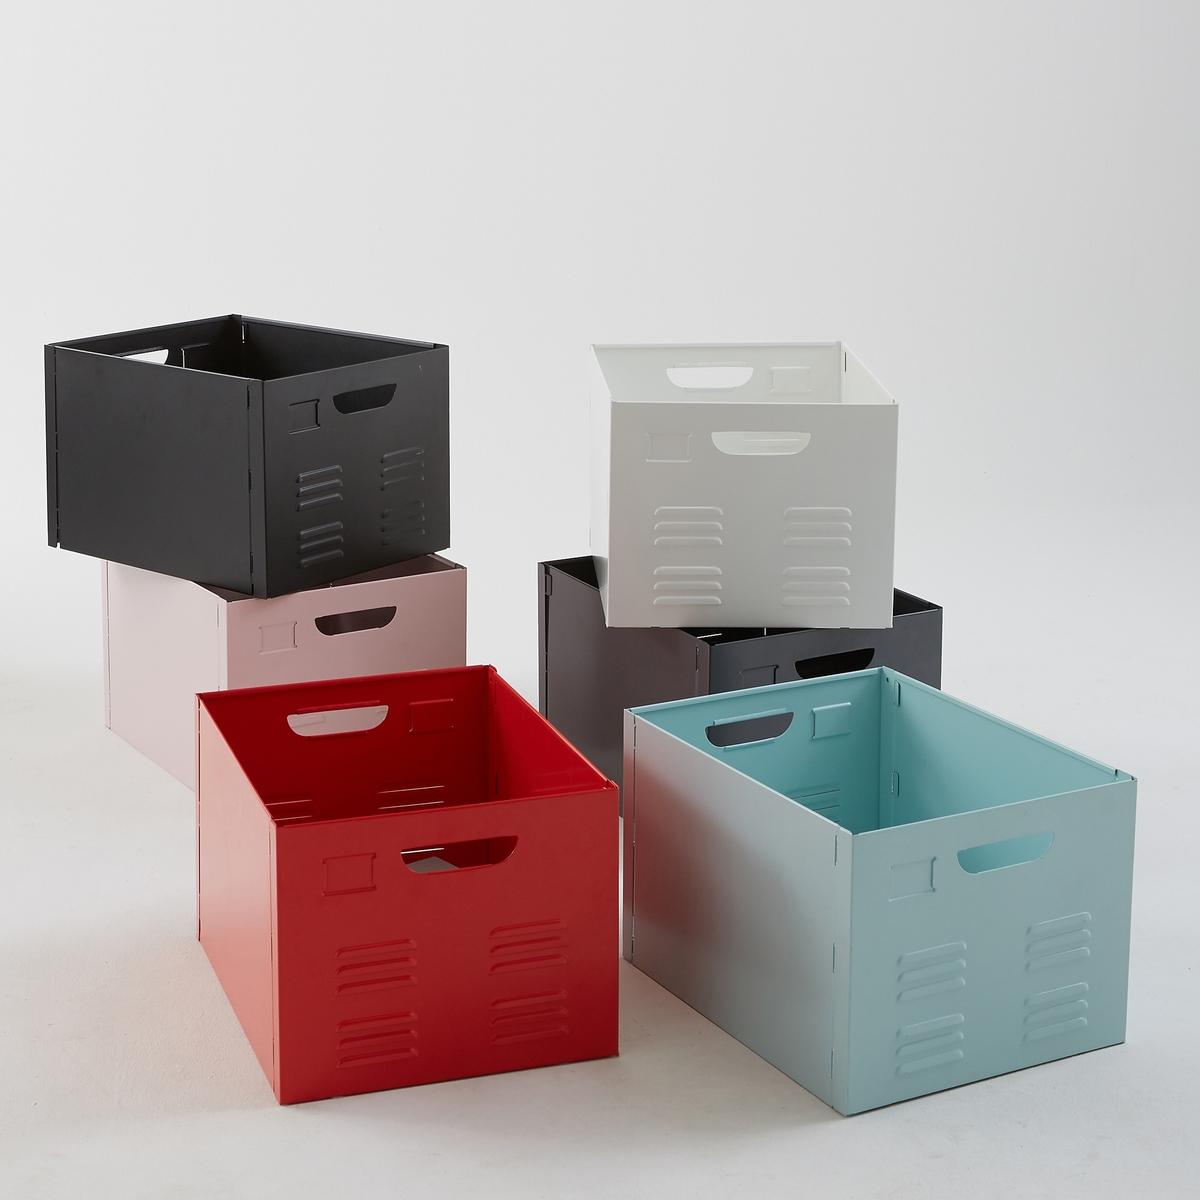 Ящик металлический, HIBA edo косметика ящик для хранения ящик для хранения пластиковых шкафов для хранения ящик для хранения тетрадей th1160 green